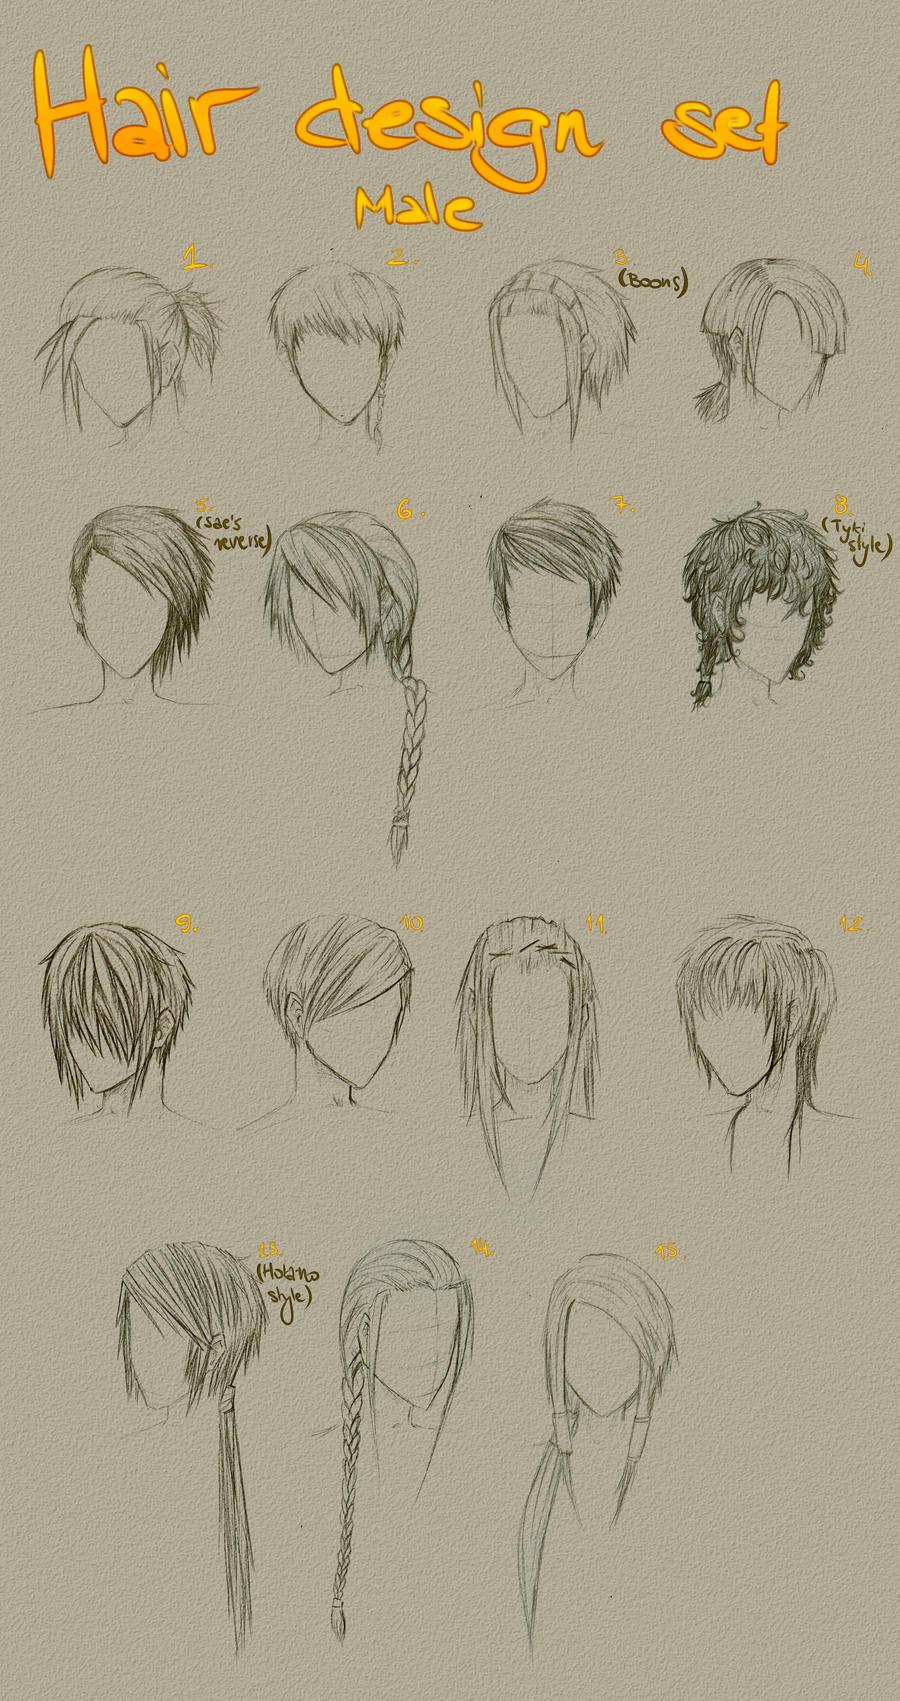 Hair design set 1 by Little-Groove-Girl